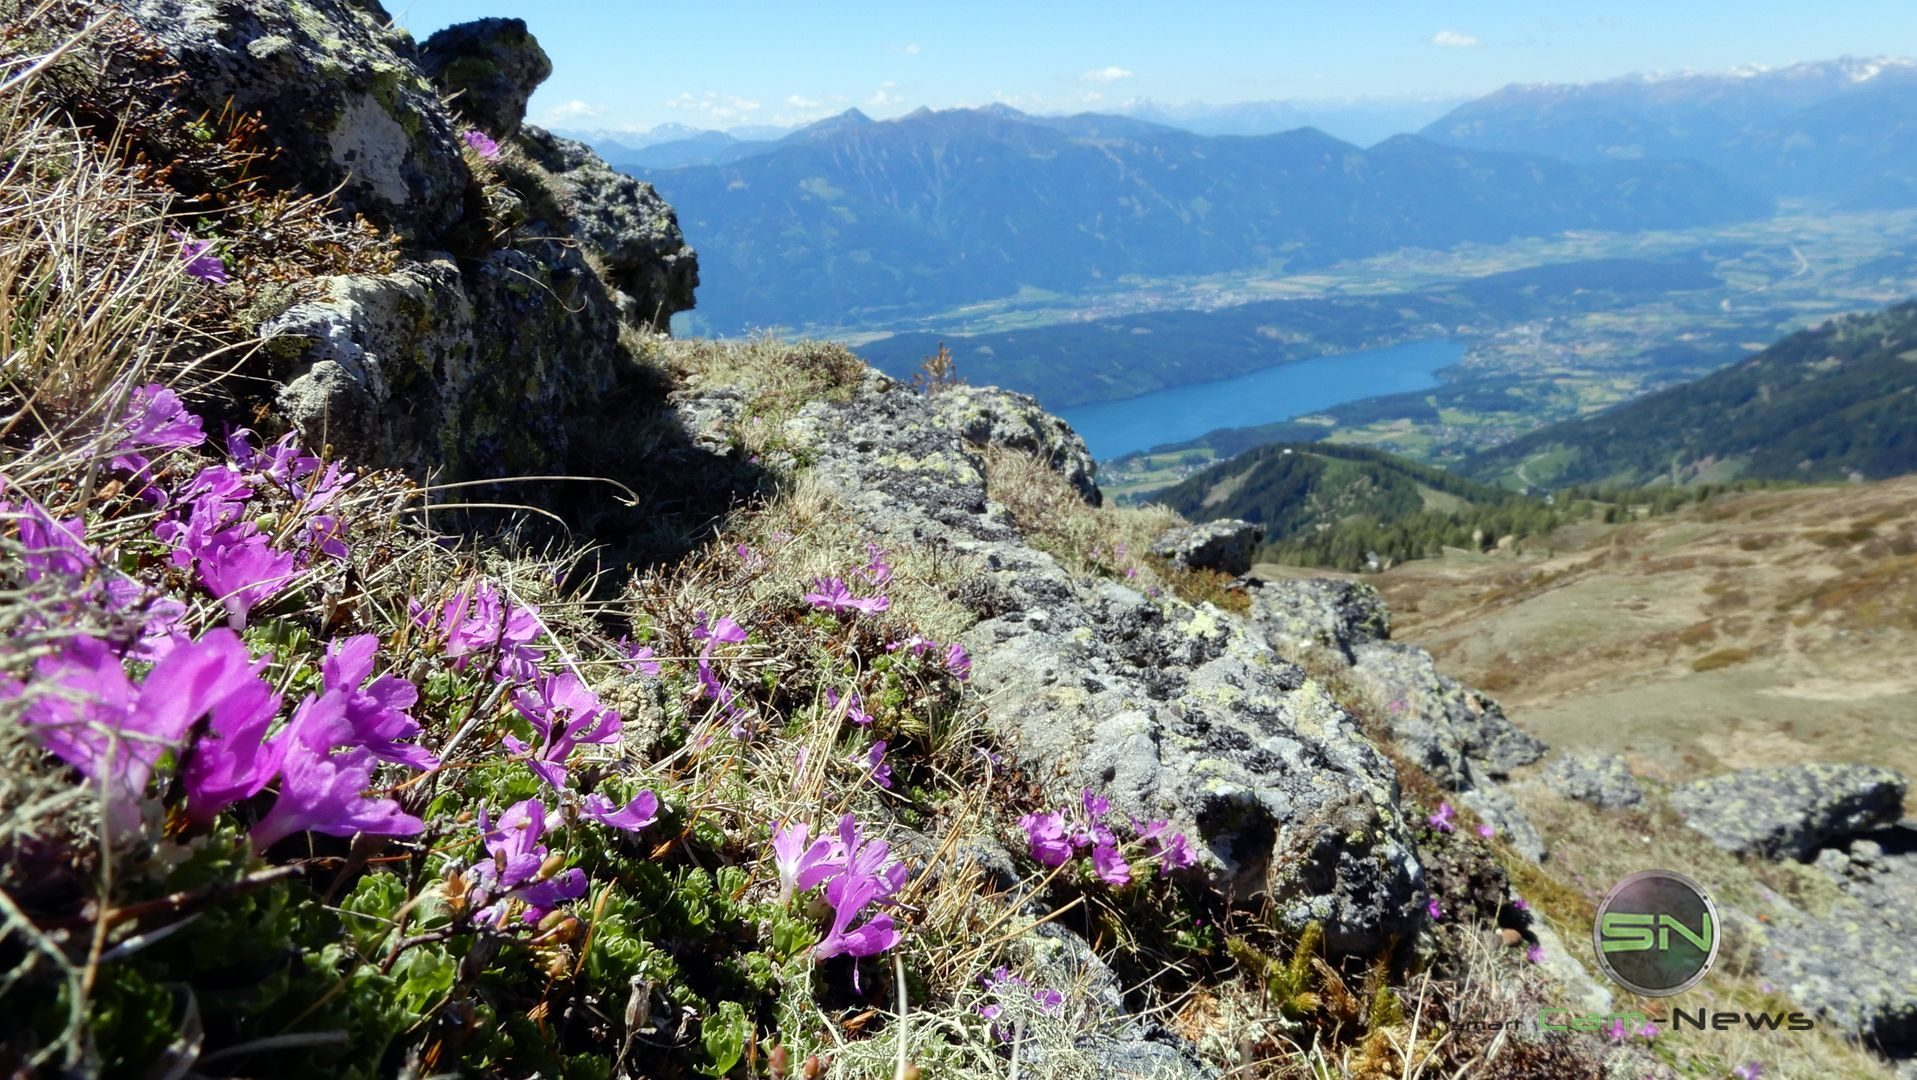 Alpenrosen - Nikon Coolpix A900 MegaZoom 35fach - Kärnten Millsättersee - SmartCamNews